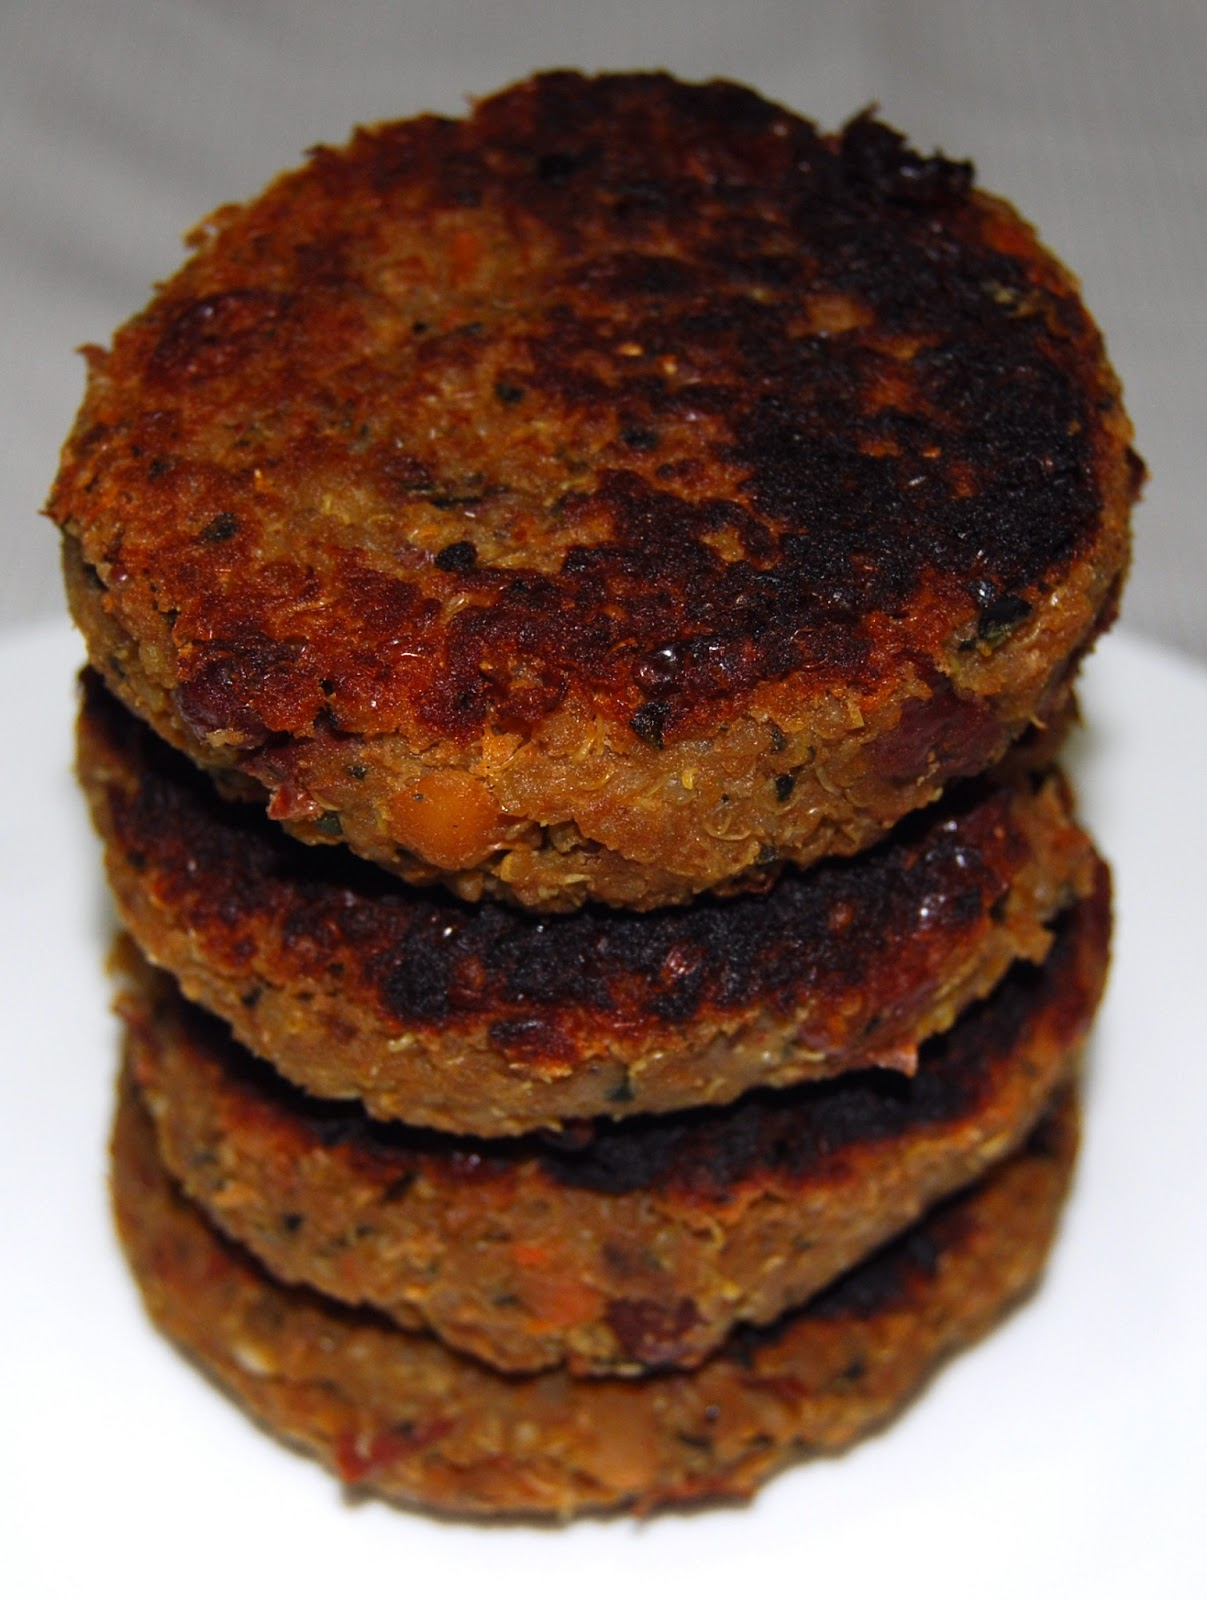 Quinoa and Bean Burger: Great-to-Grill Vegan Recipes